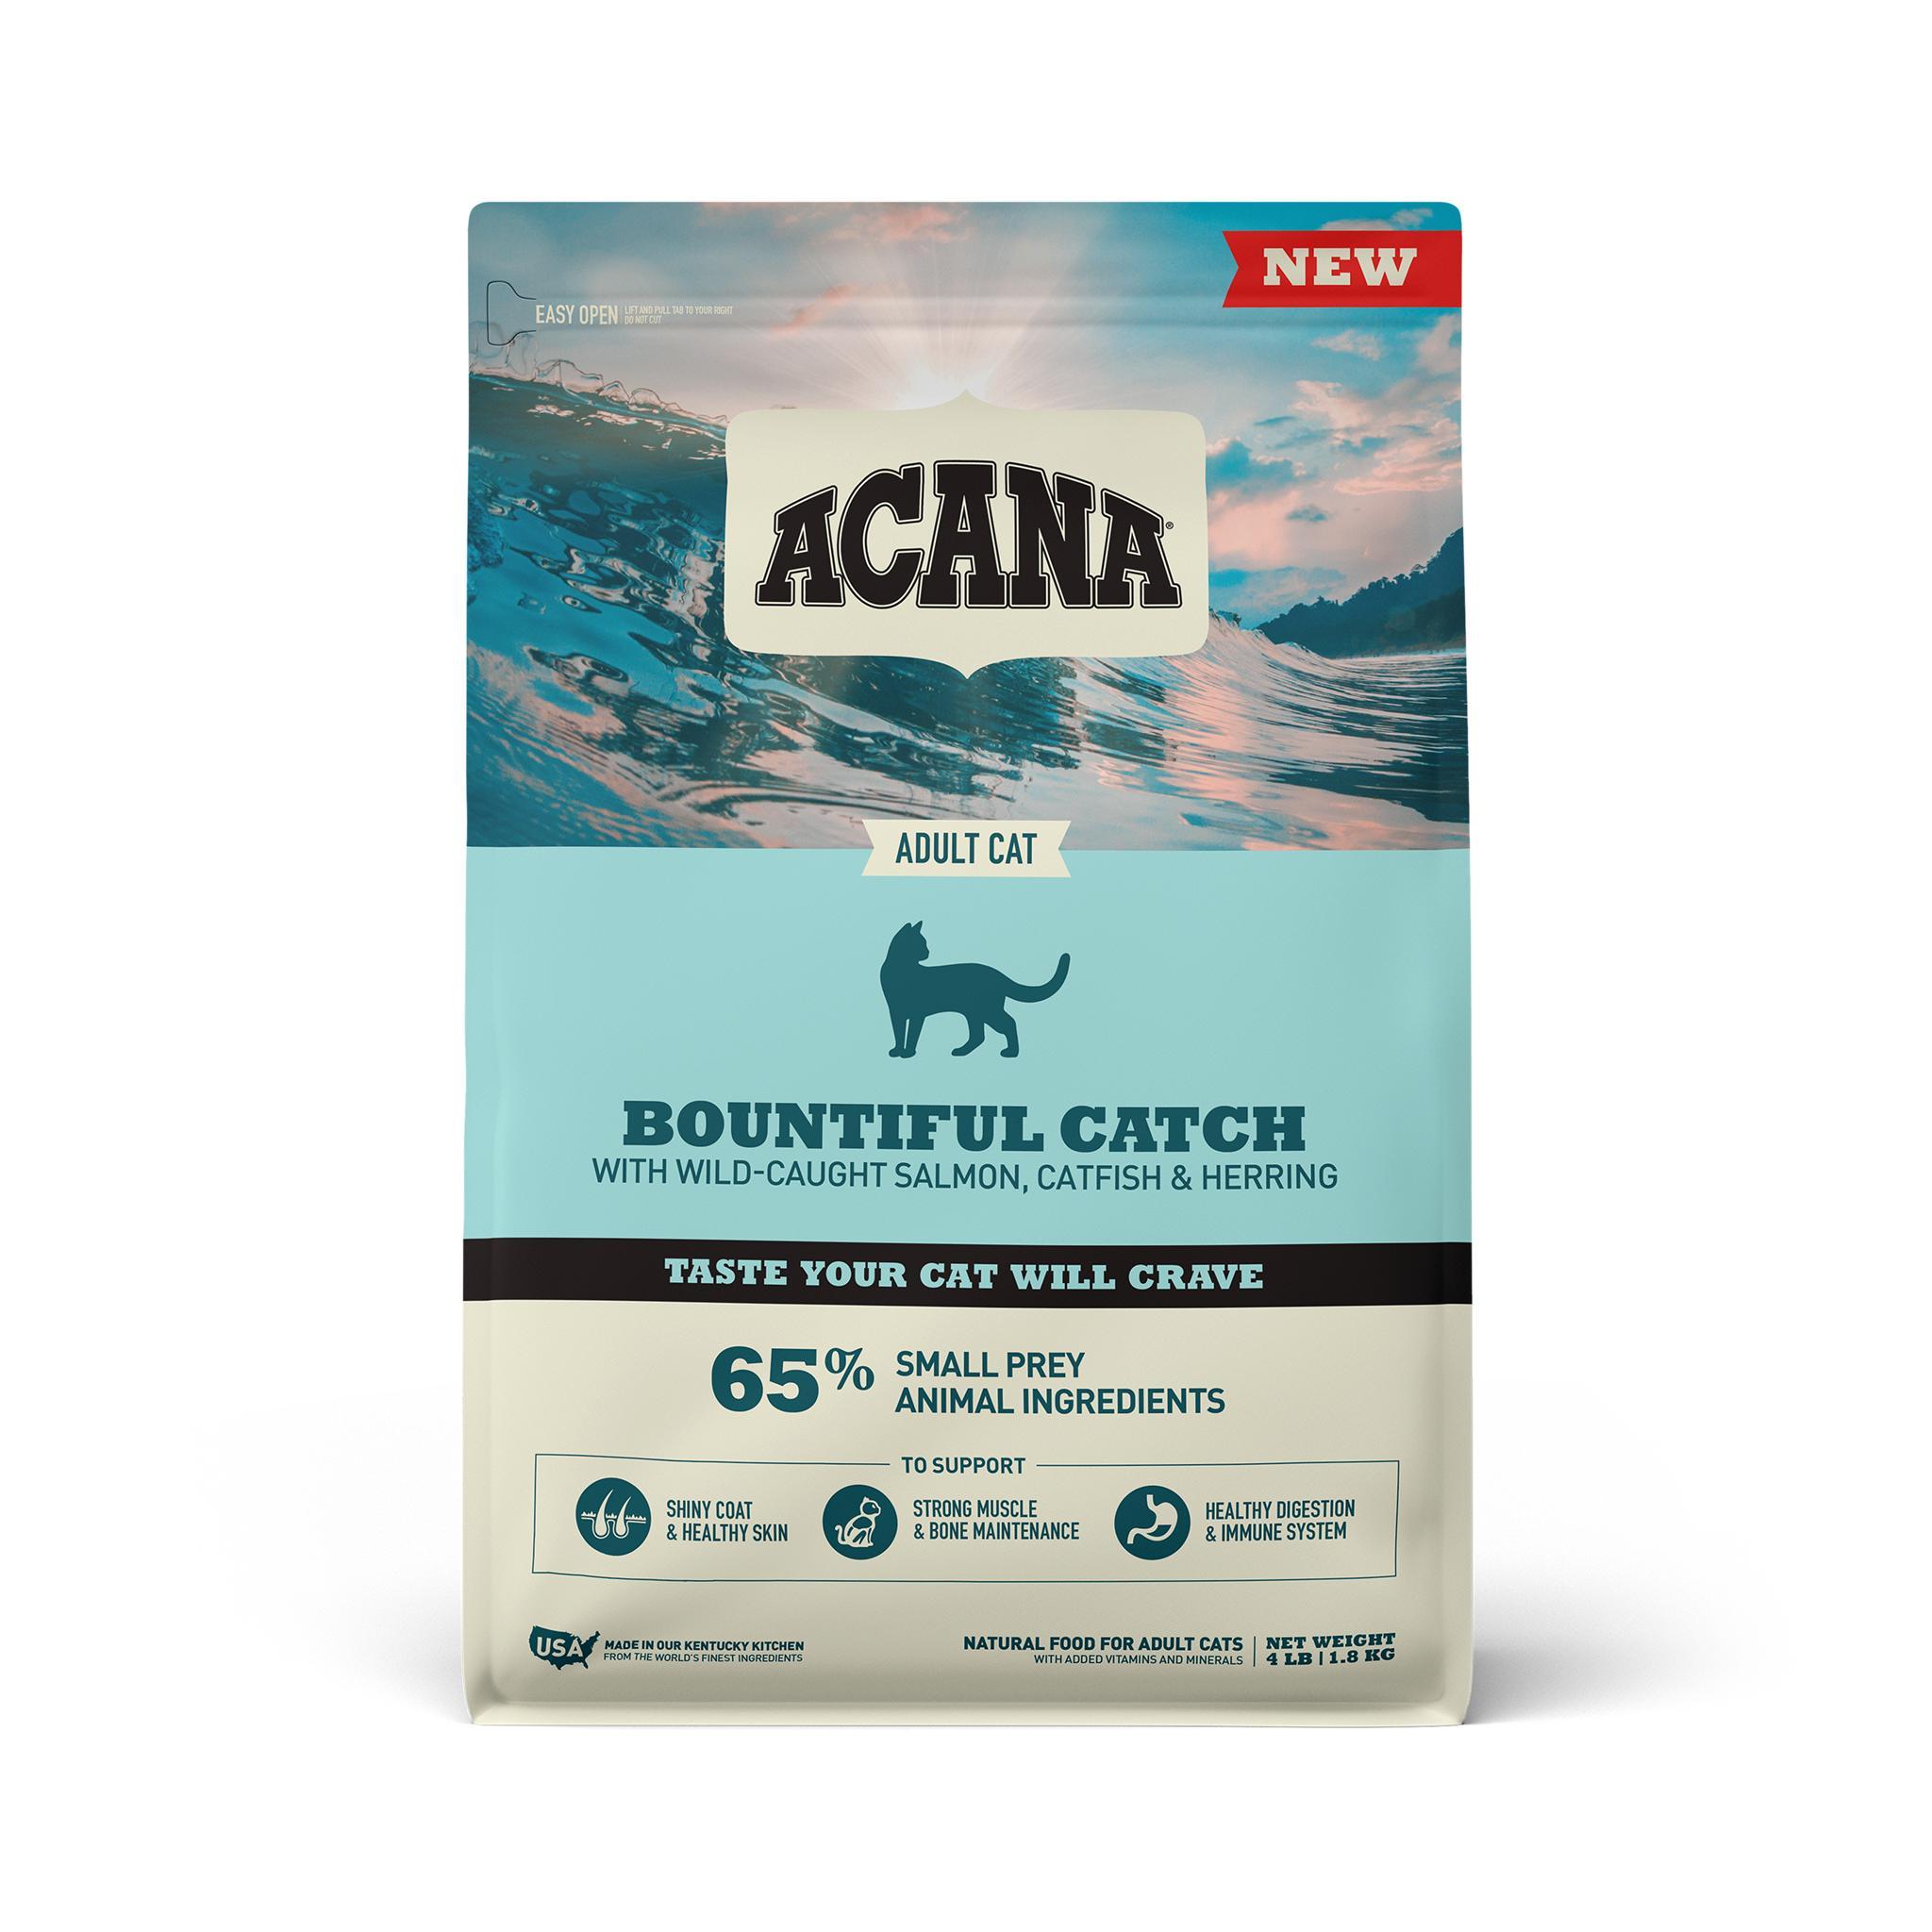 ACANA Bountiful Catch Dry Cat Food, 4-lb